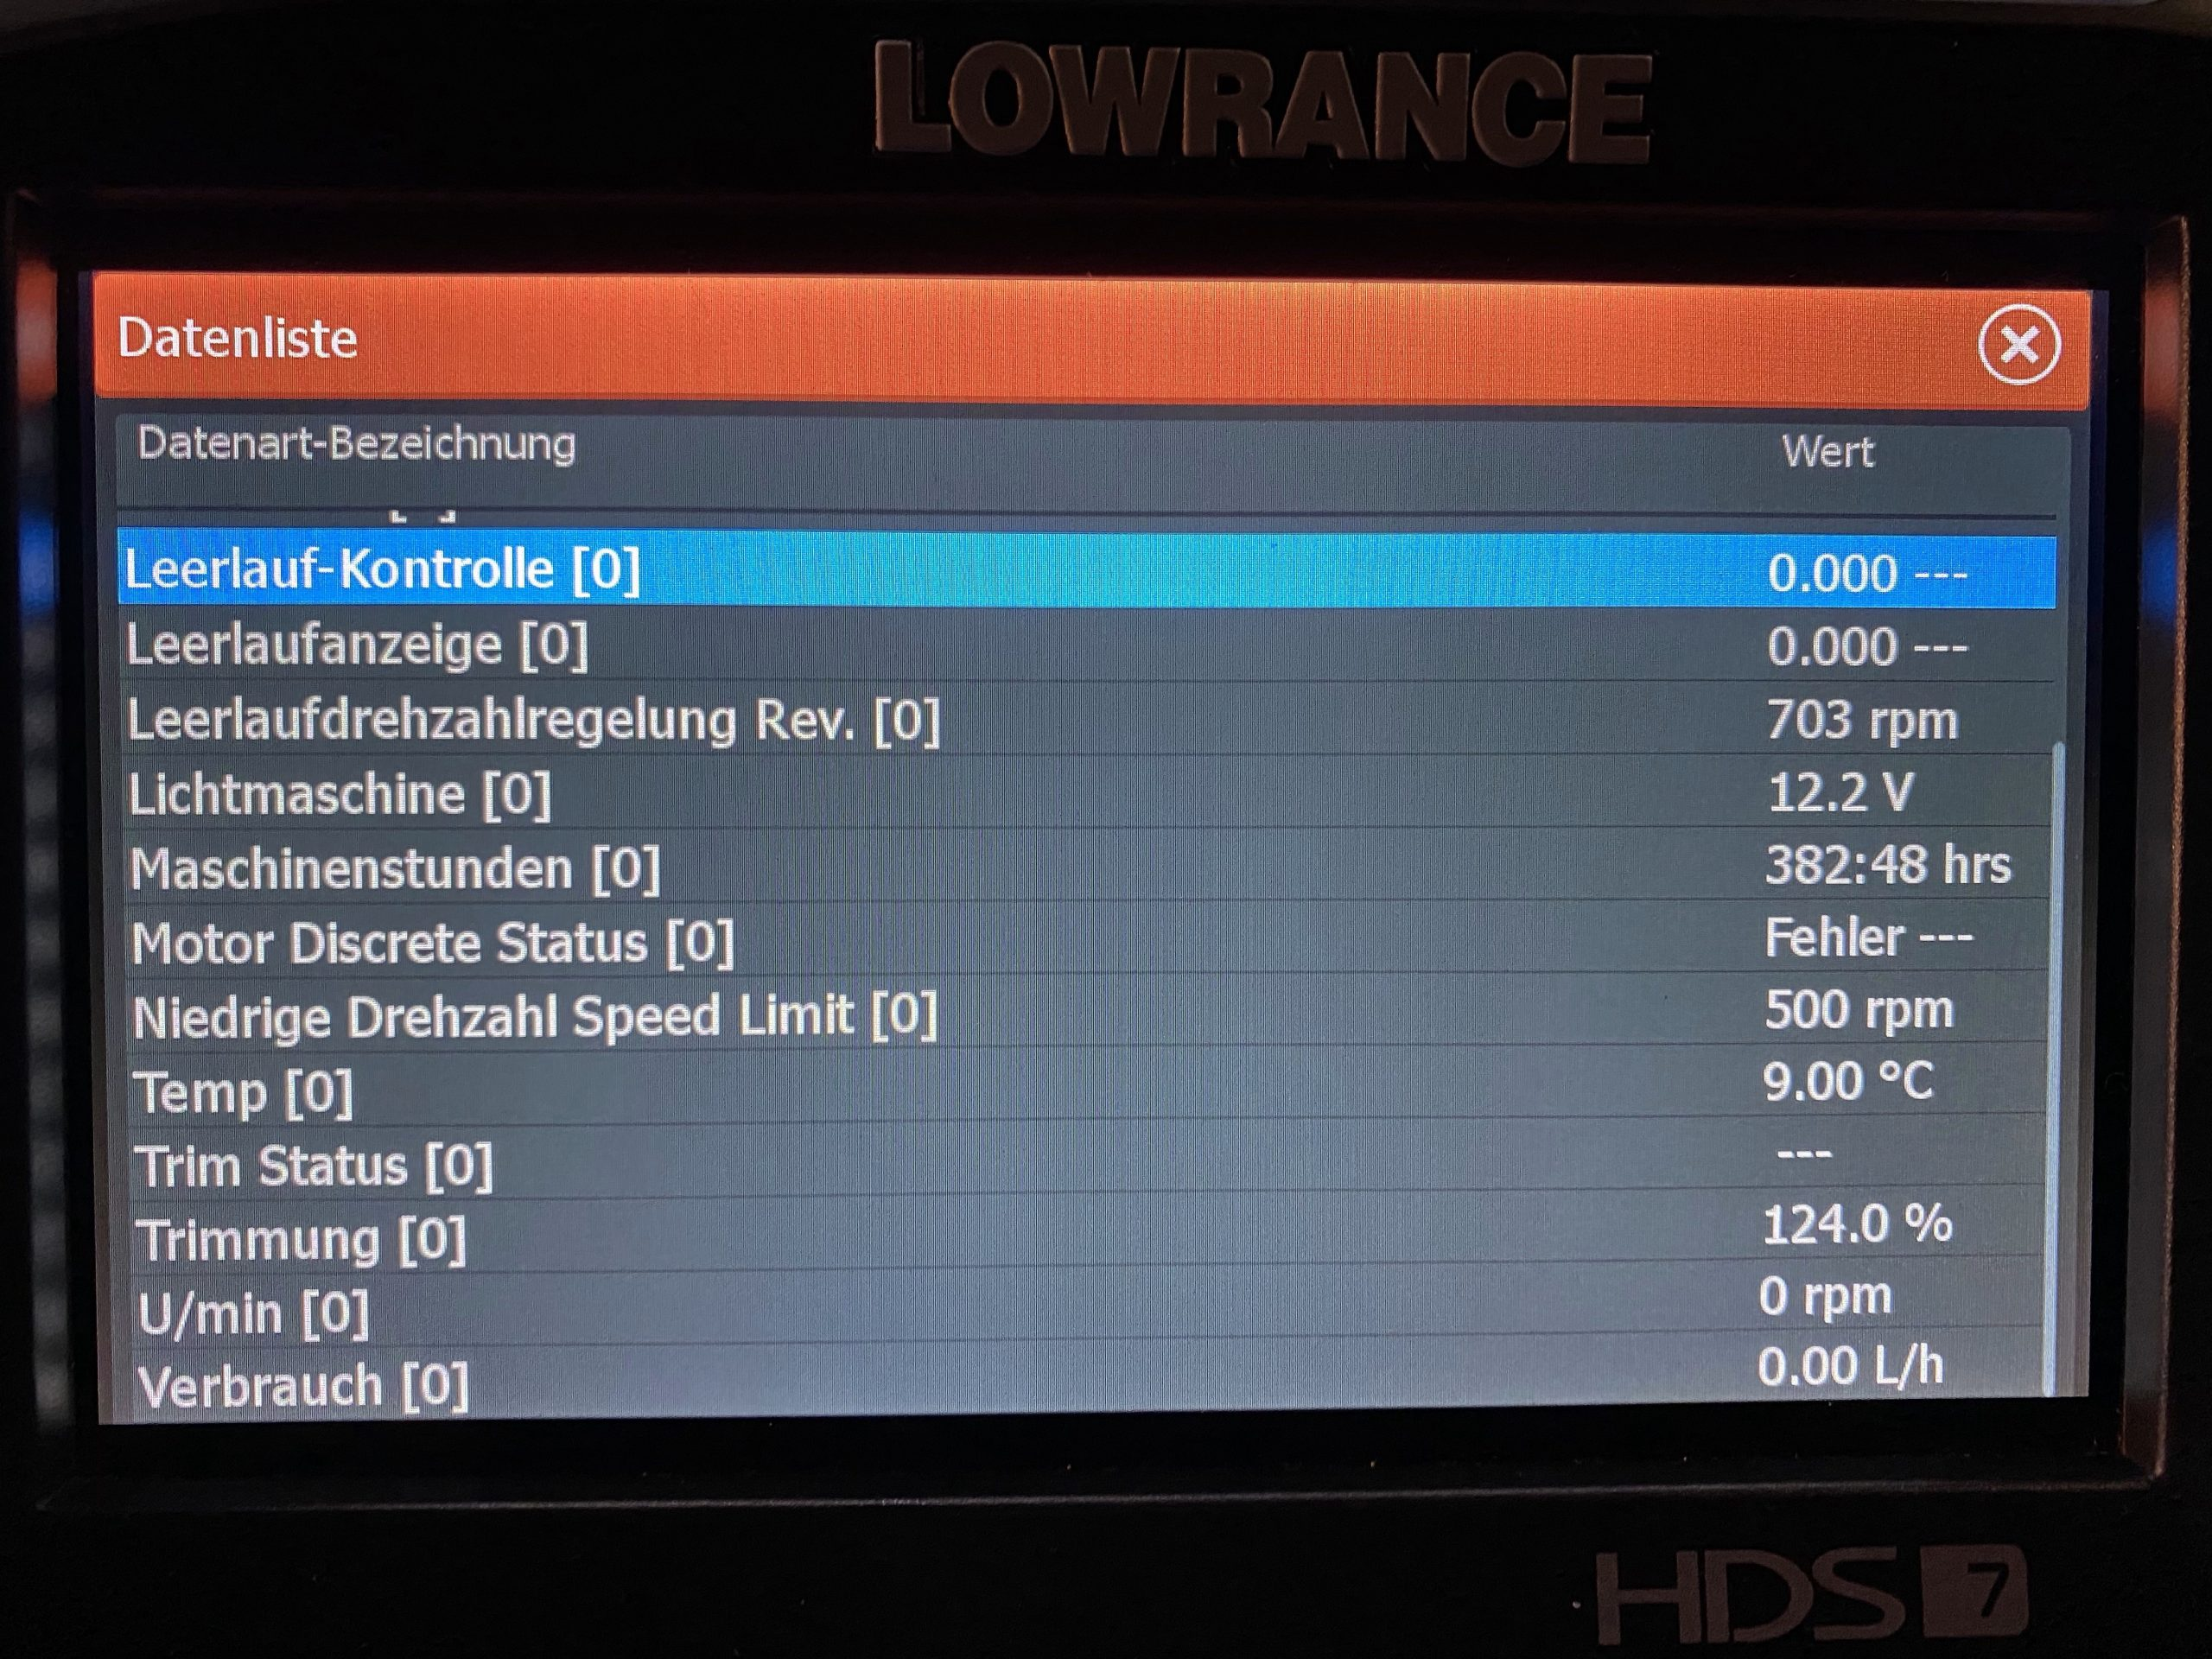 Lowrance Carbon HDS7 mit NMEA 2000 Netzwerk am Yamaha Außenborder